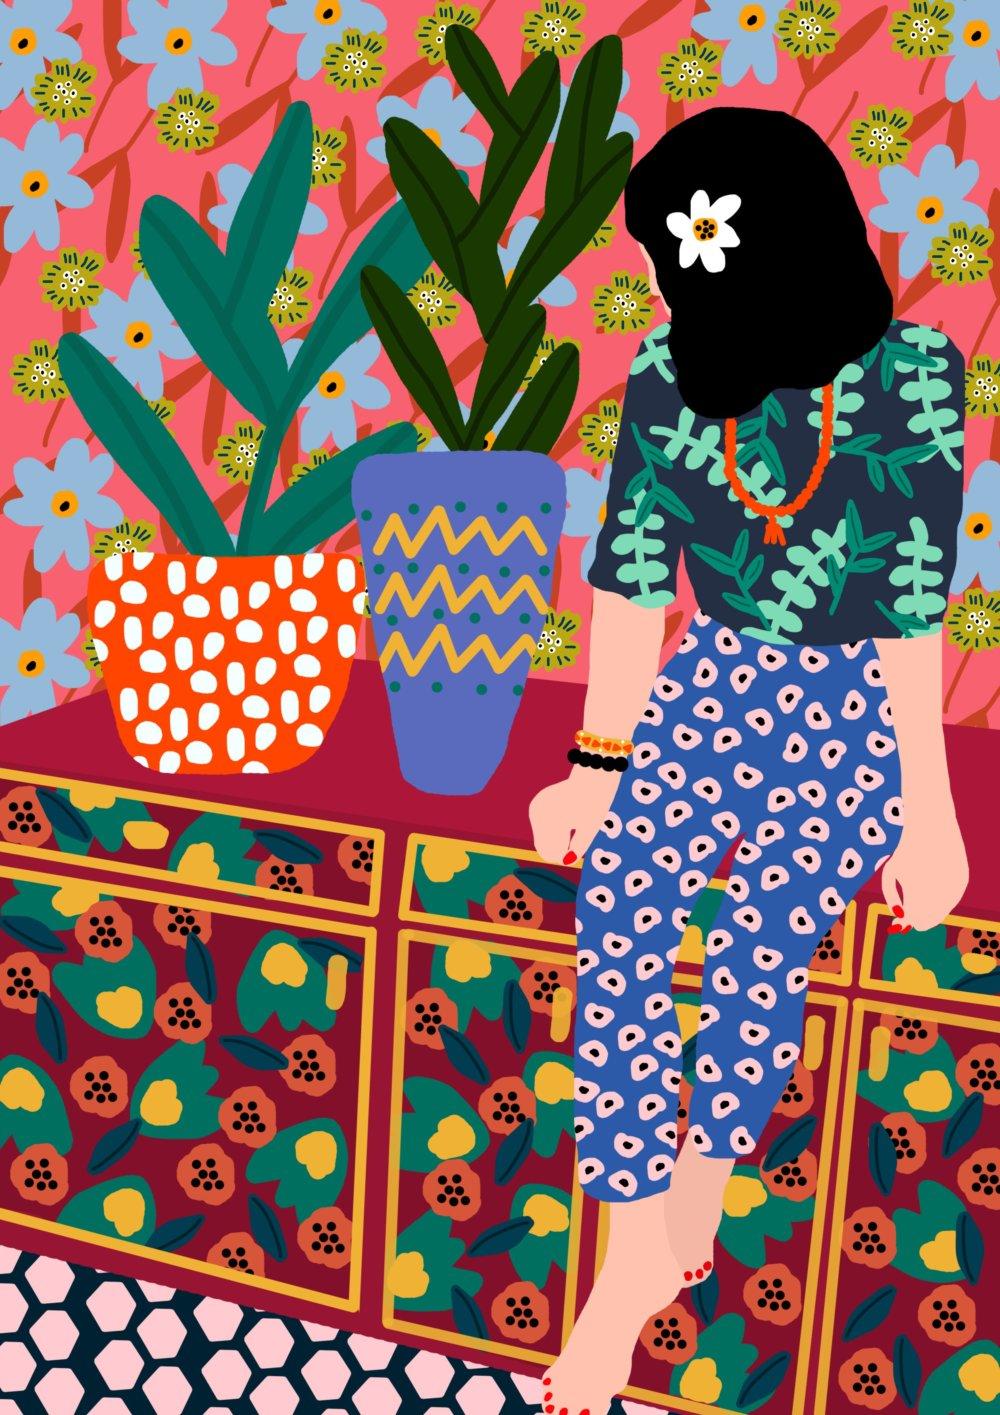 Gorgeous And Colorful Floral Illustrations By Rafaela Mascaro 3